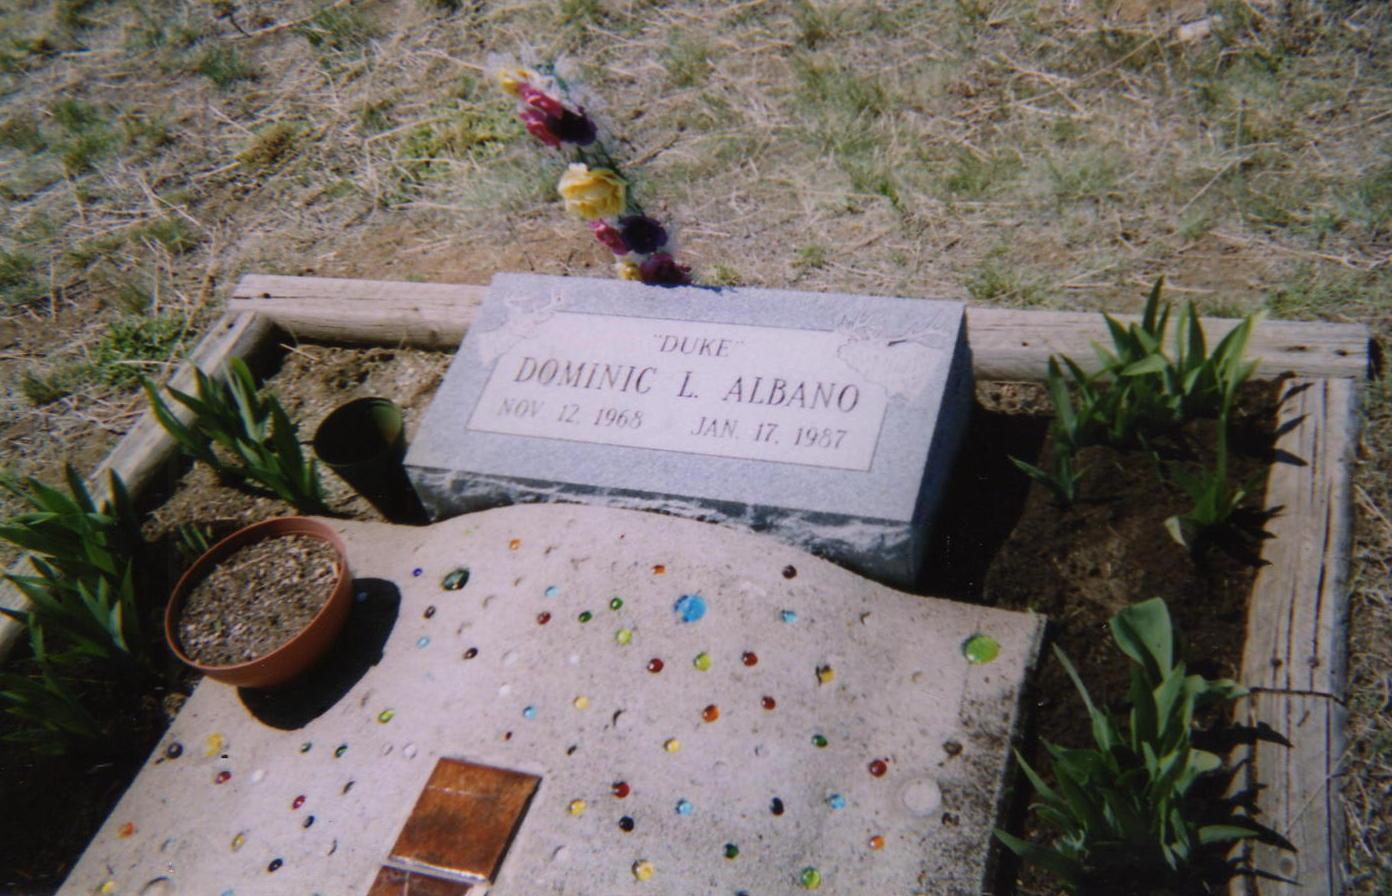 Dominic Leonard Duke Albano